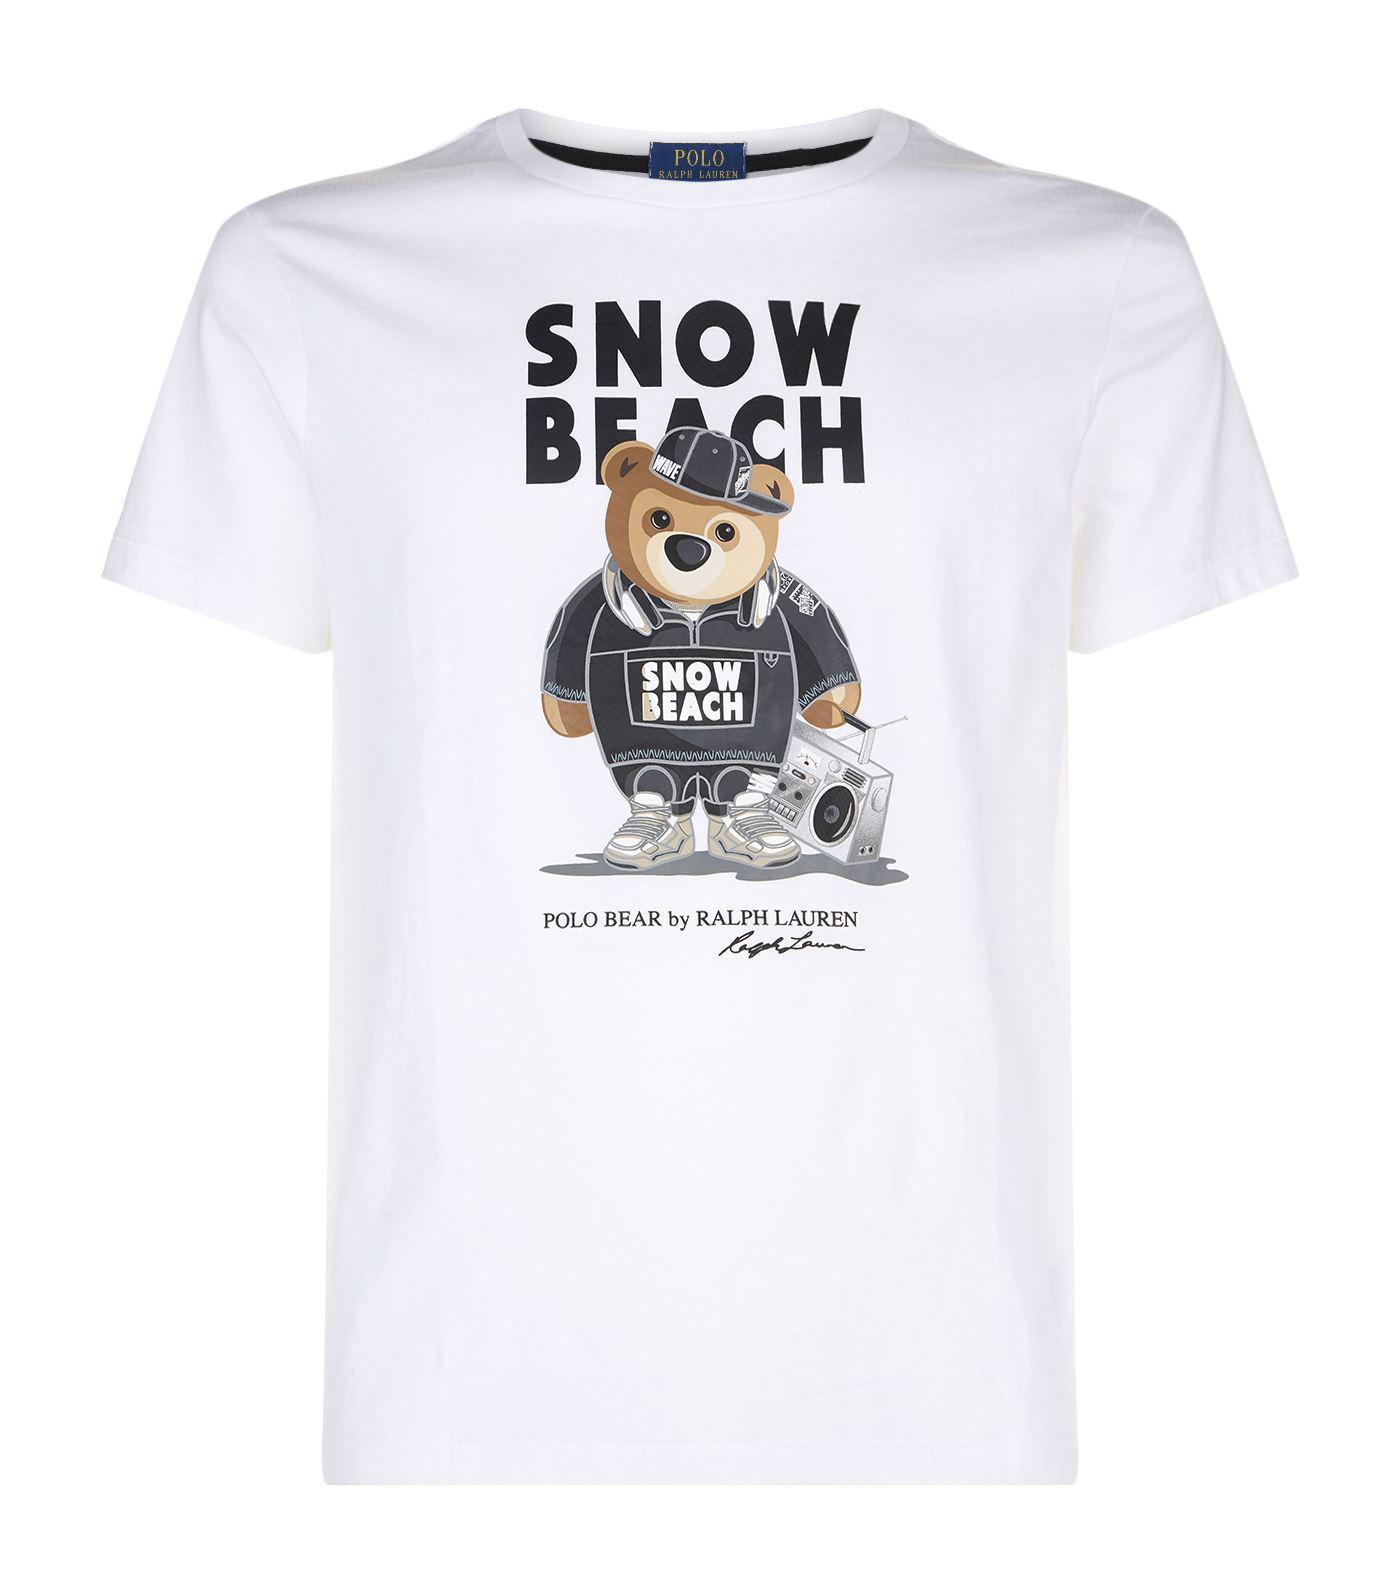 Ralph Lauren Snow Beach Bear T-shirt in White for Men